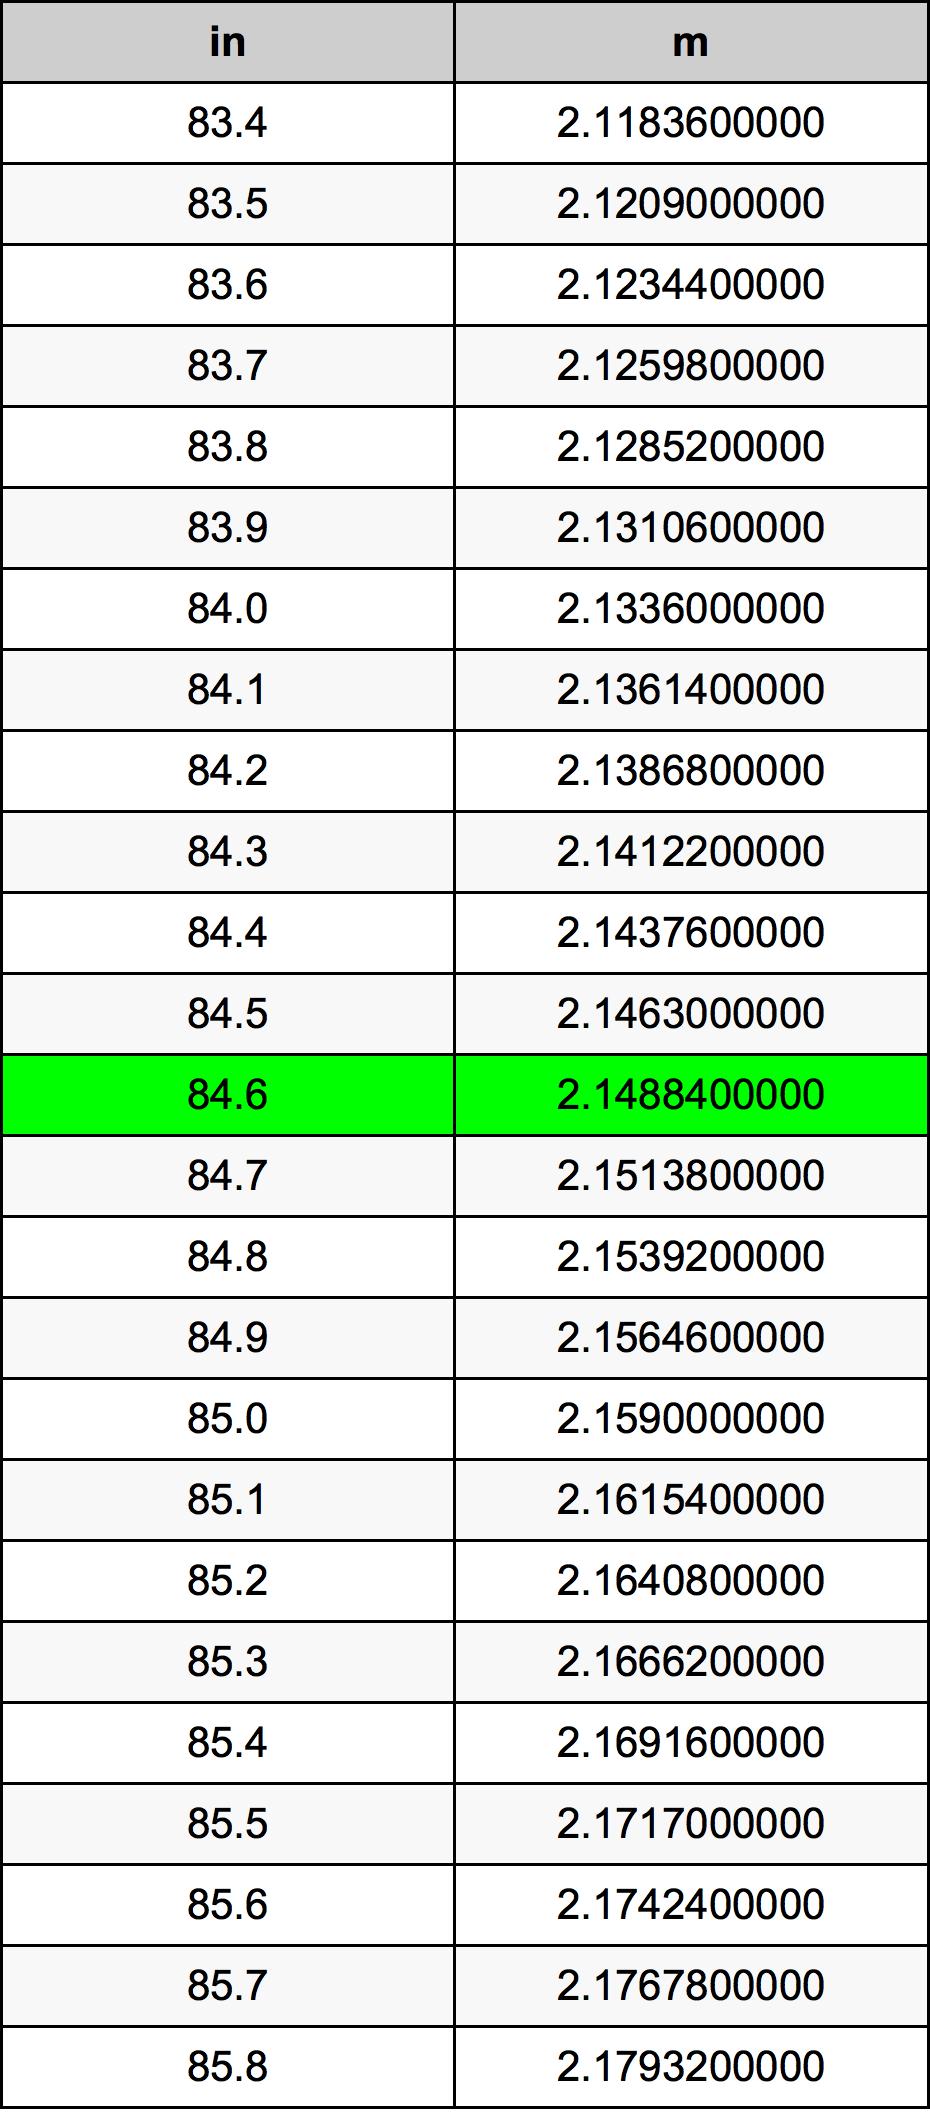 84.6 Inch konverteringstabell